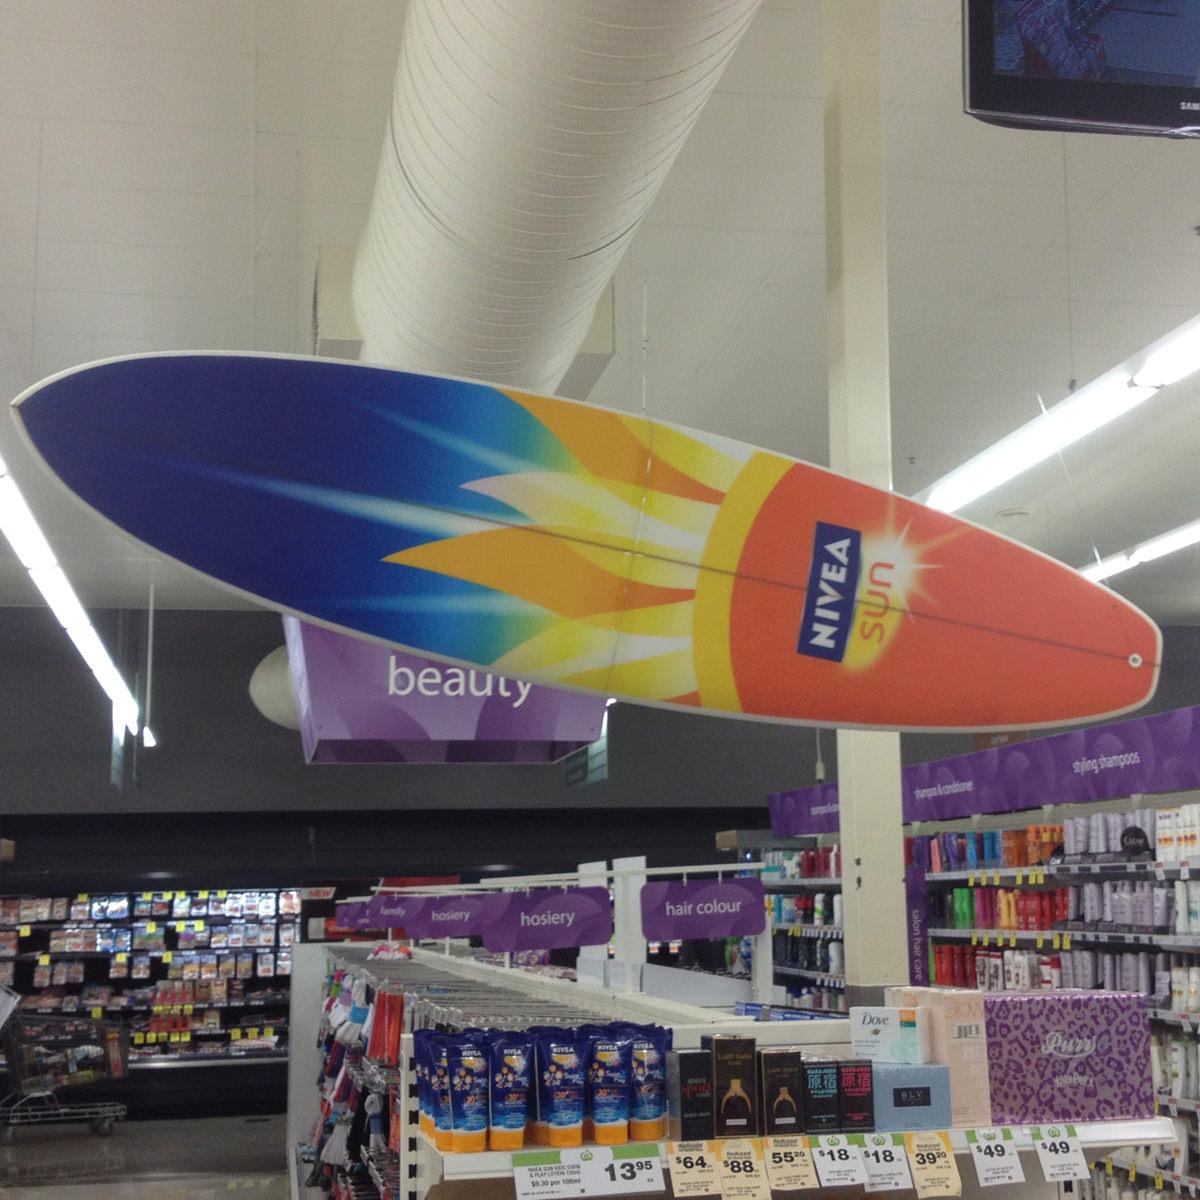 IMG_3306 surfboard.JPG